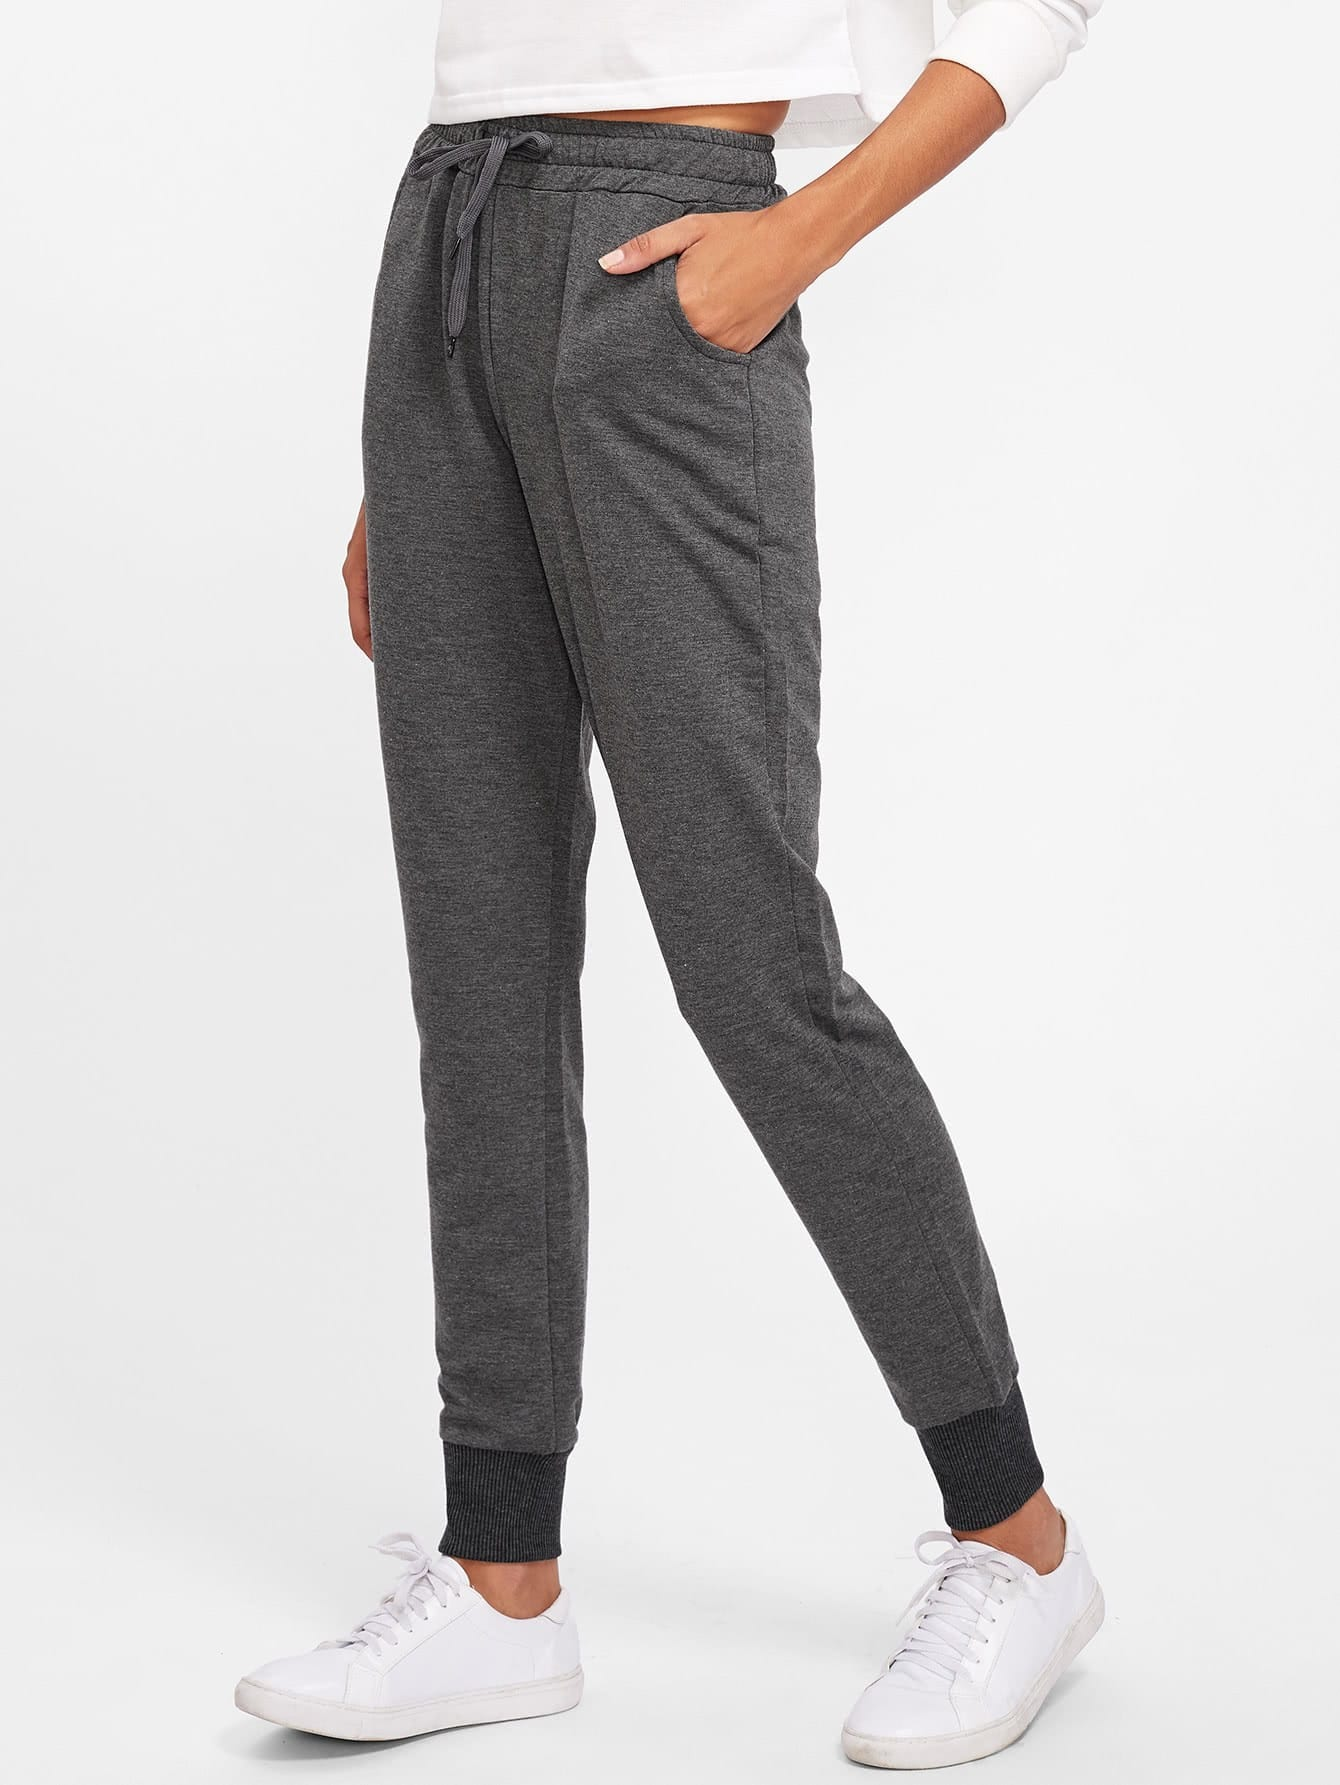 Drawstring Waist Sweatpants pants170926121